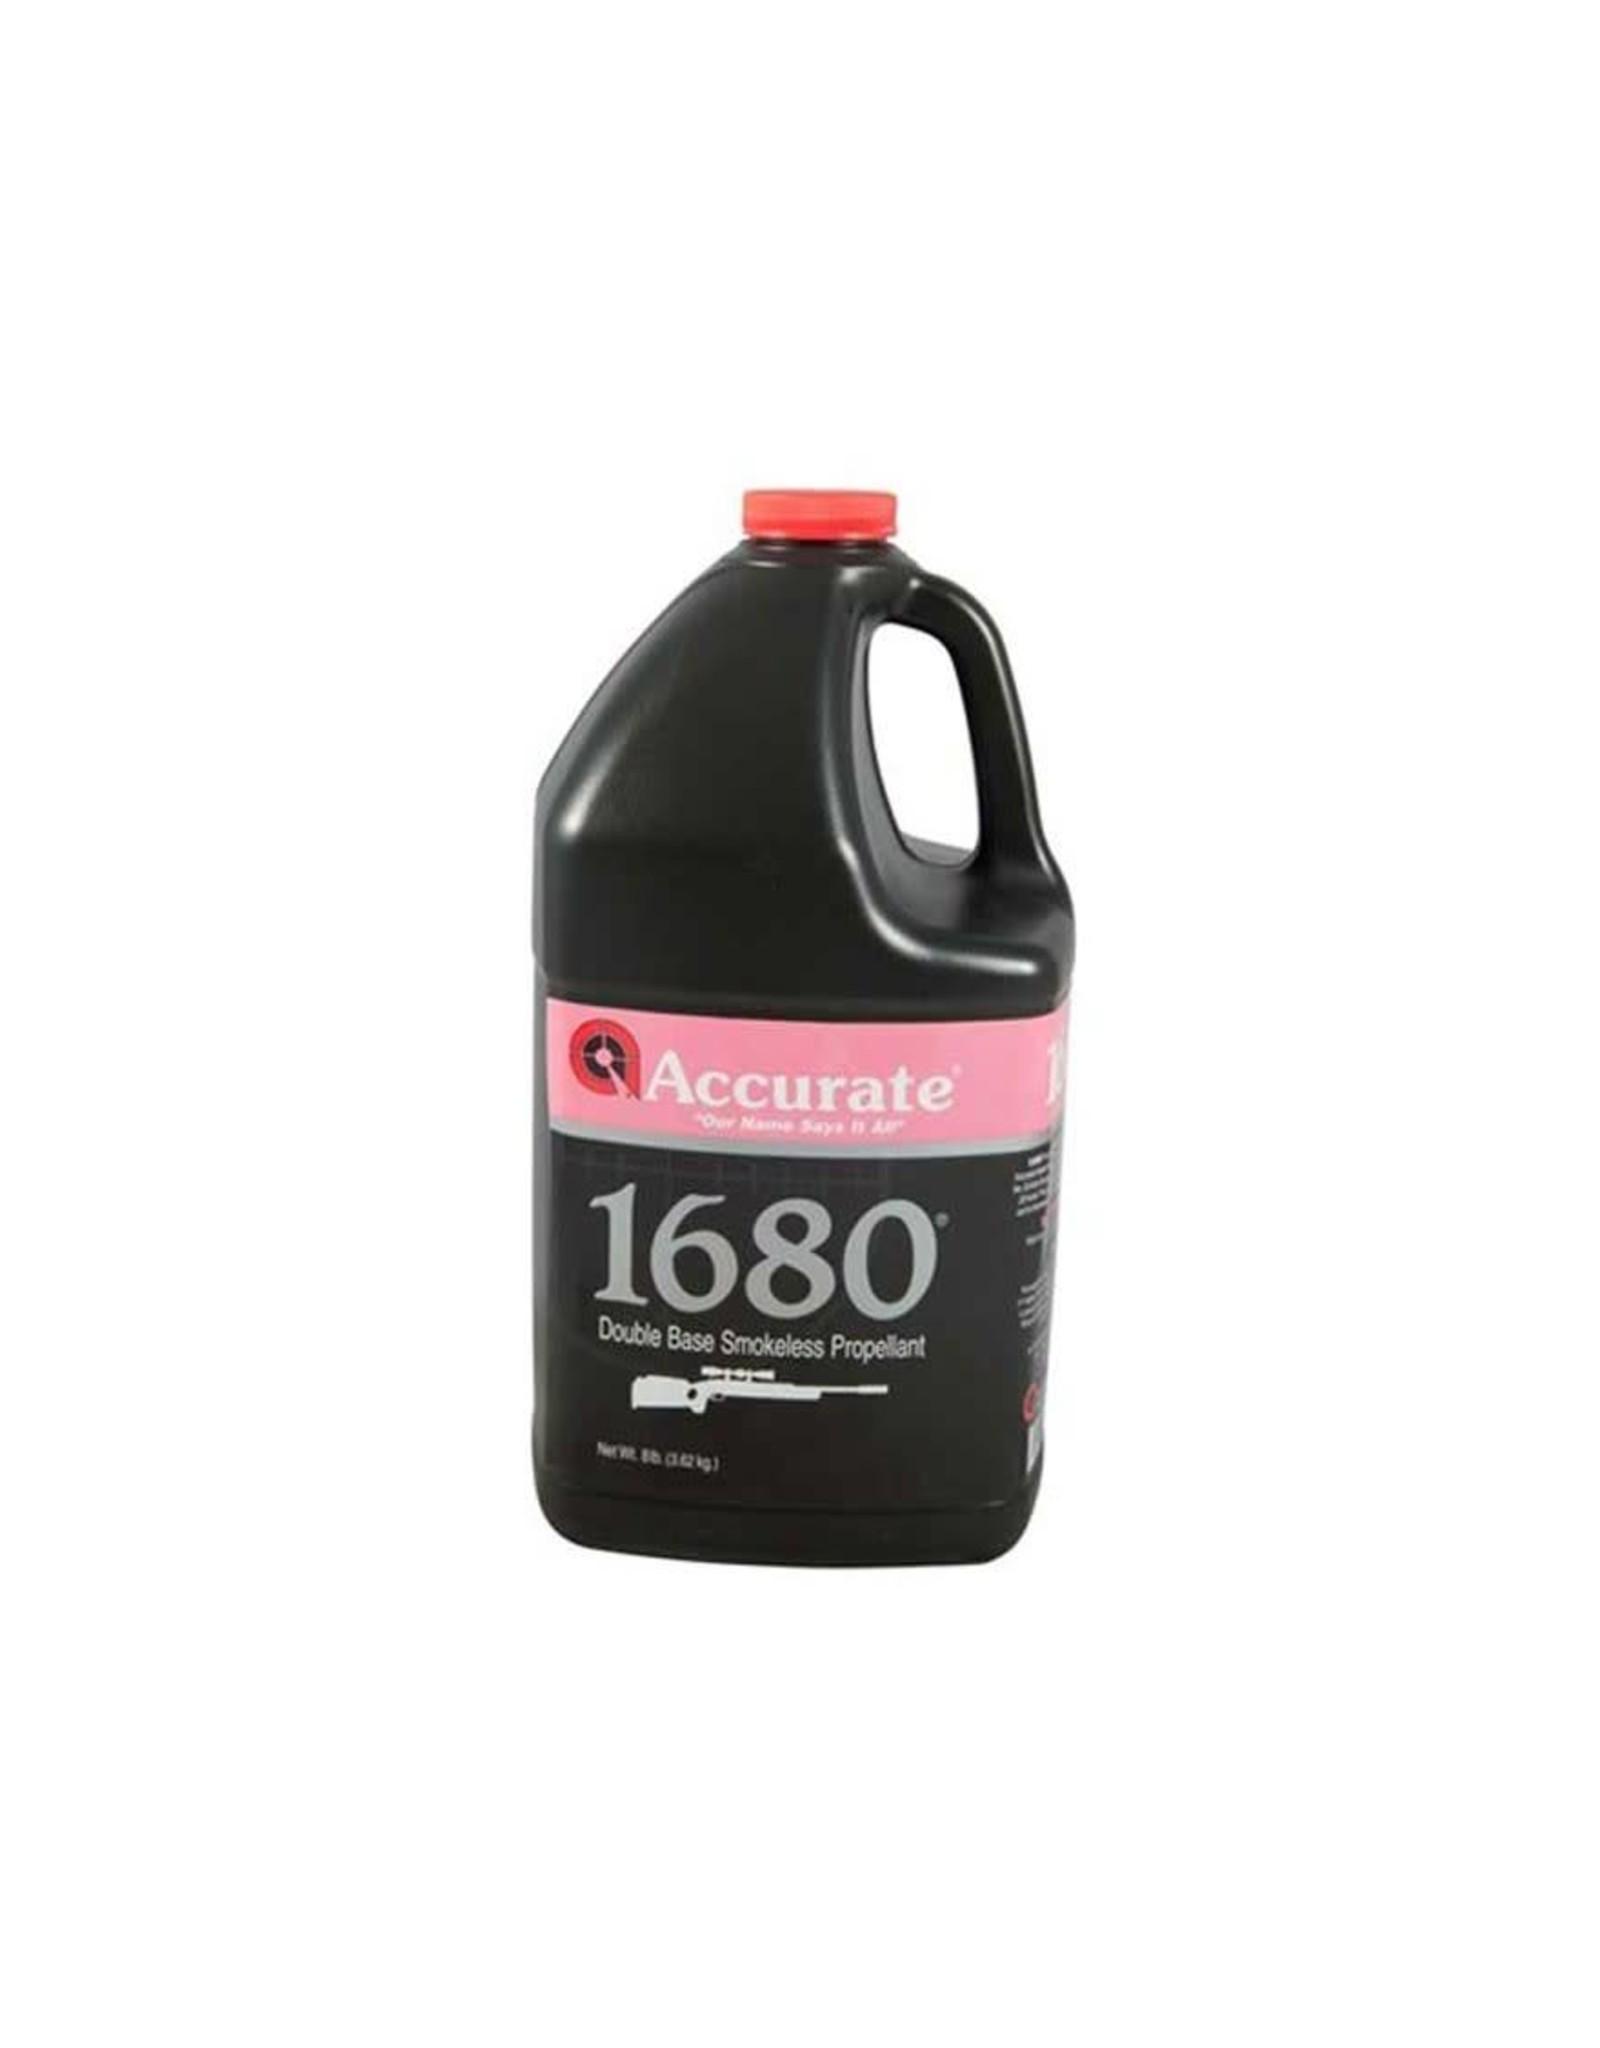 Accurate Accurate 1680 -  8 pound